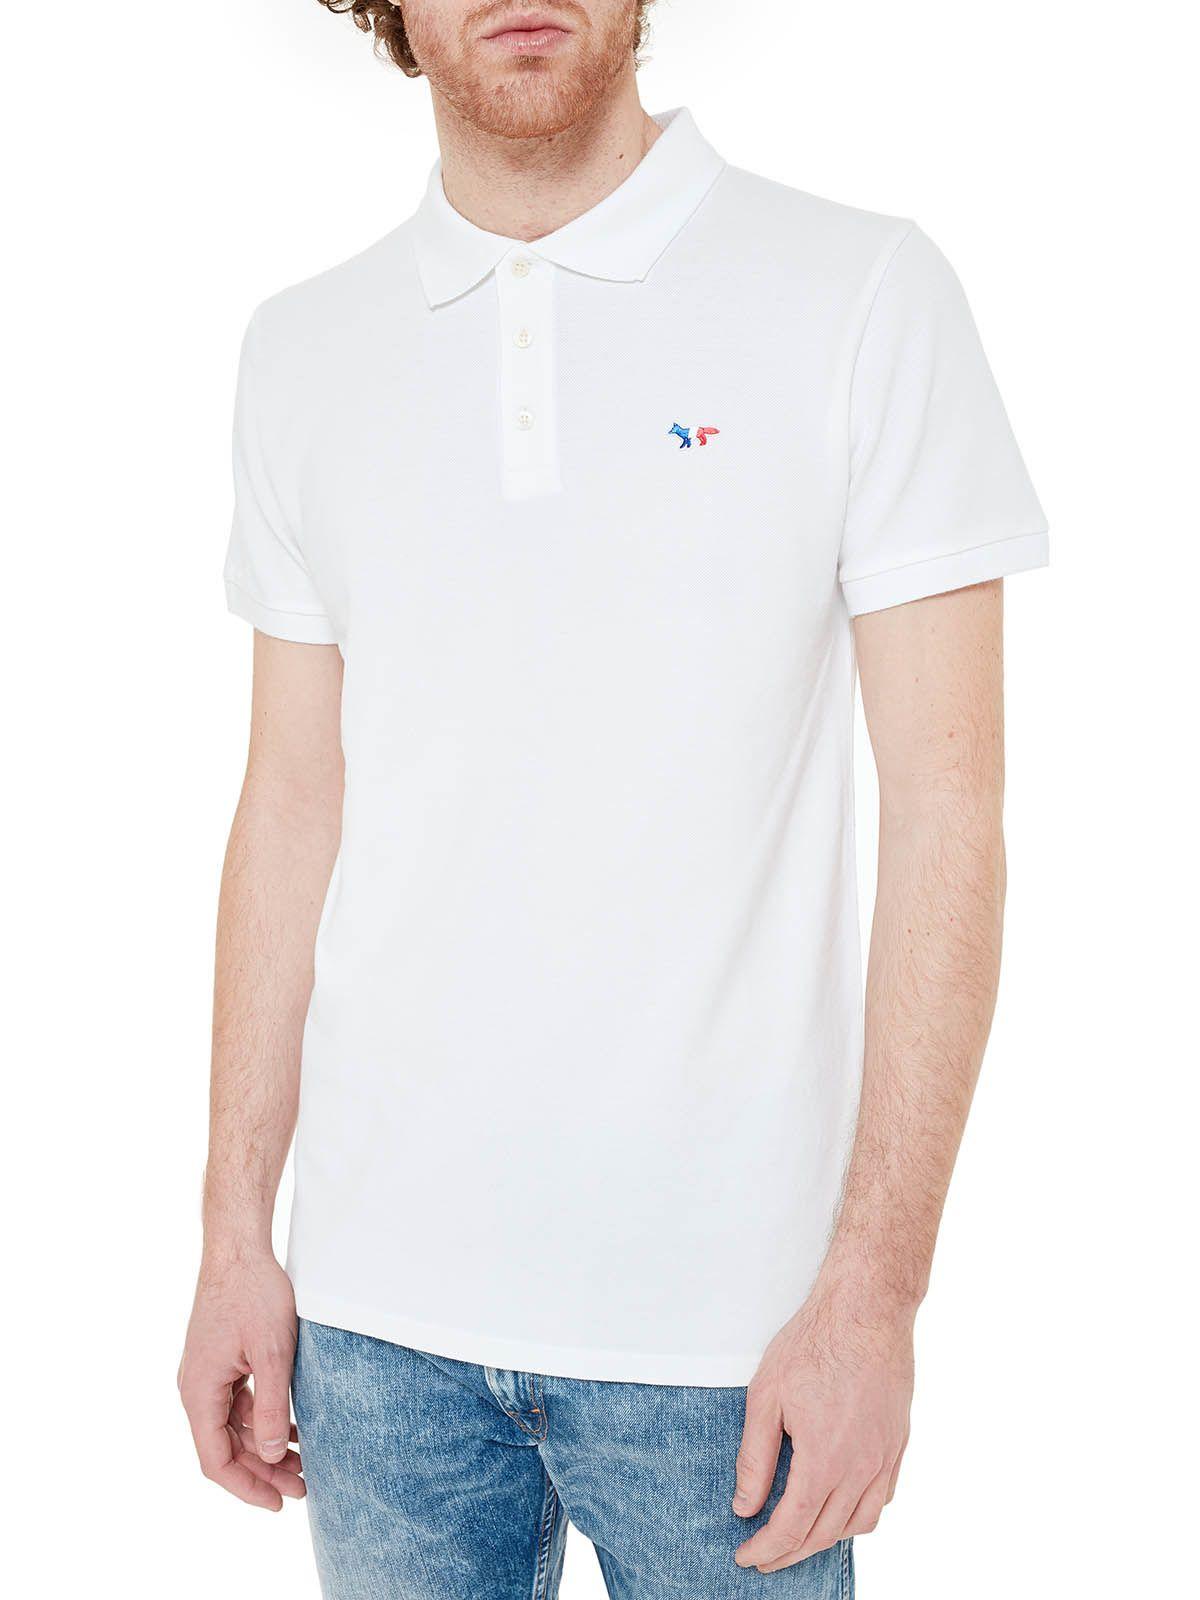 Maison Kitsun? Embroidered Logo Polo Shirt